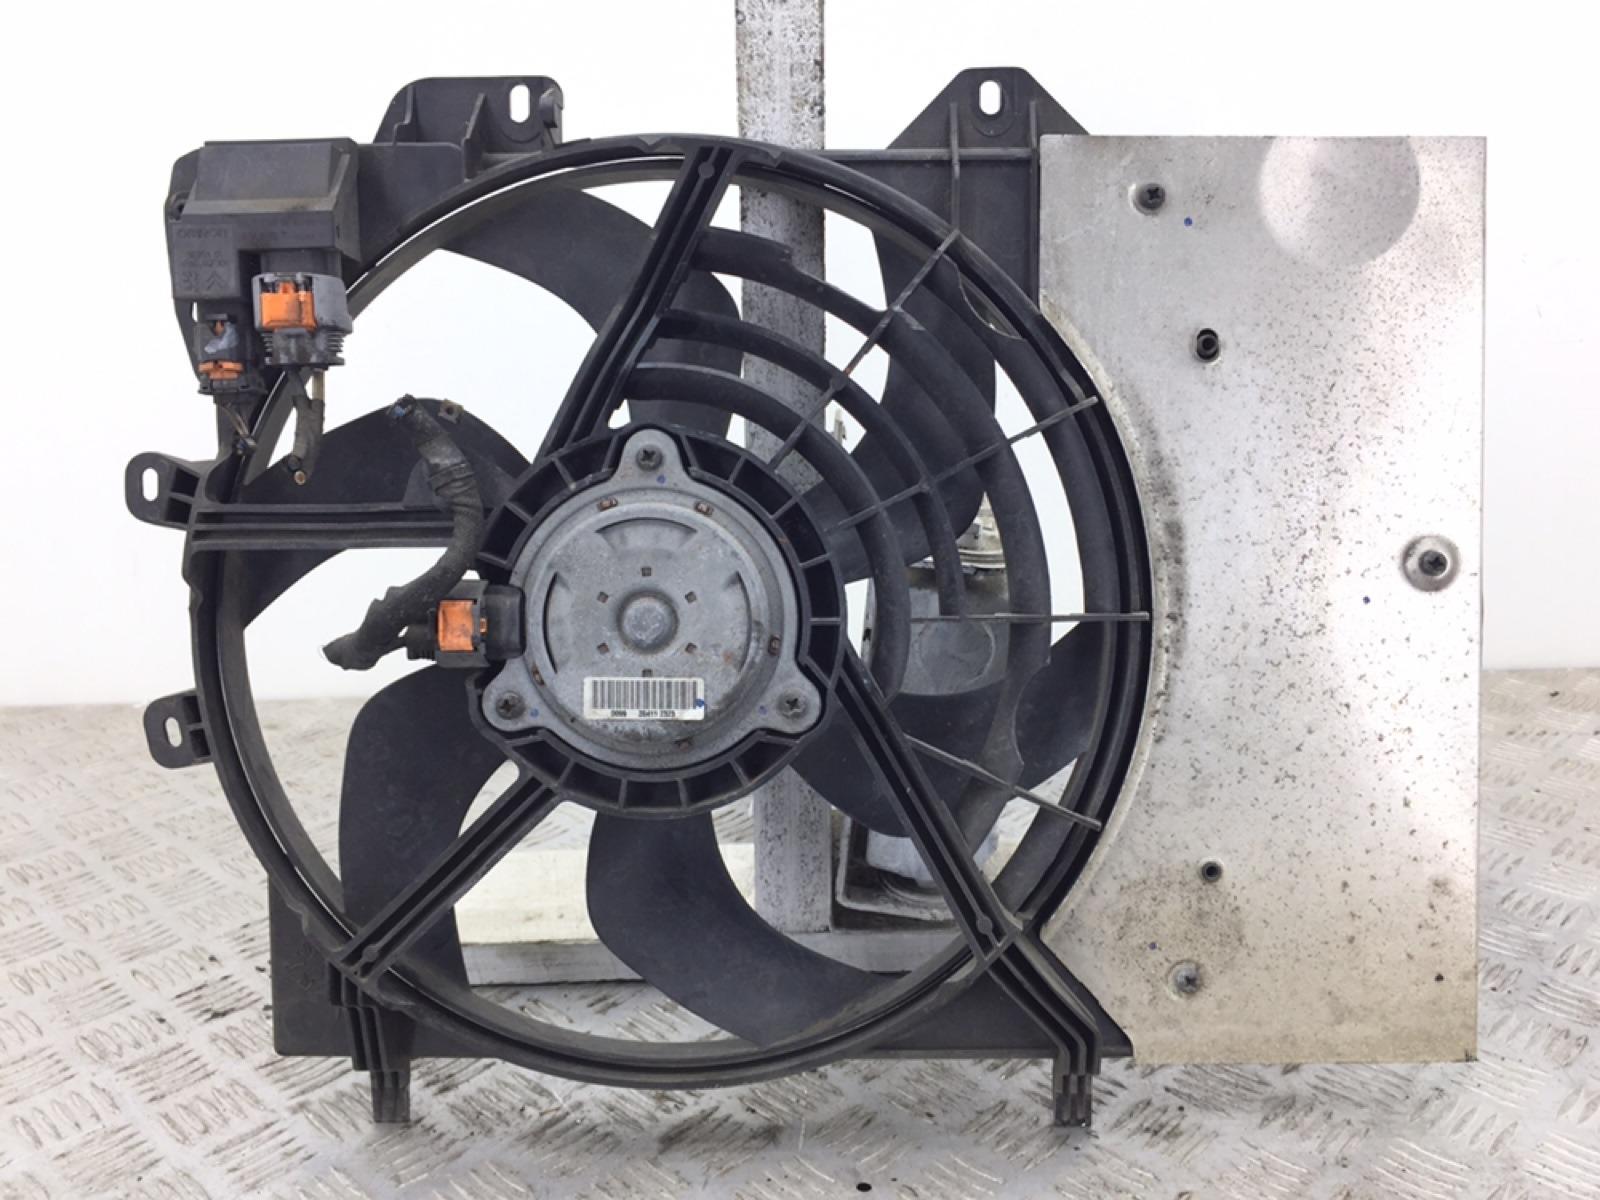 Вентилятор радиатора Peugeot 207 1.6 HDI 2011 (б/у)